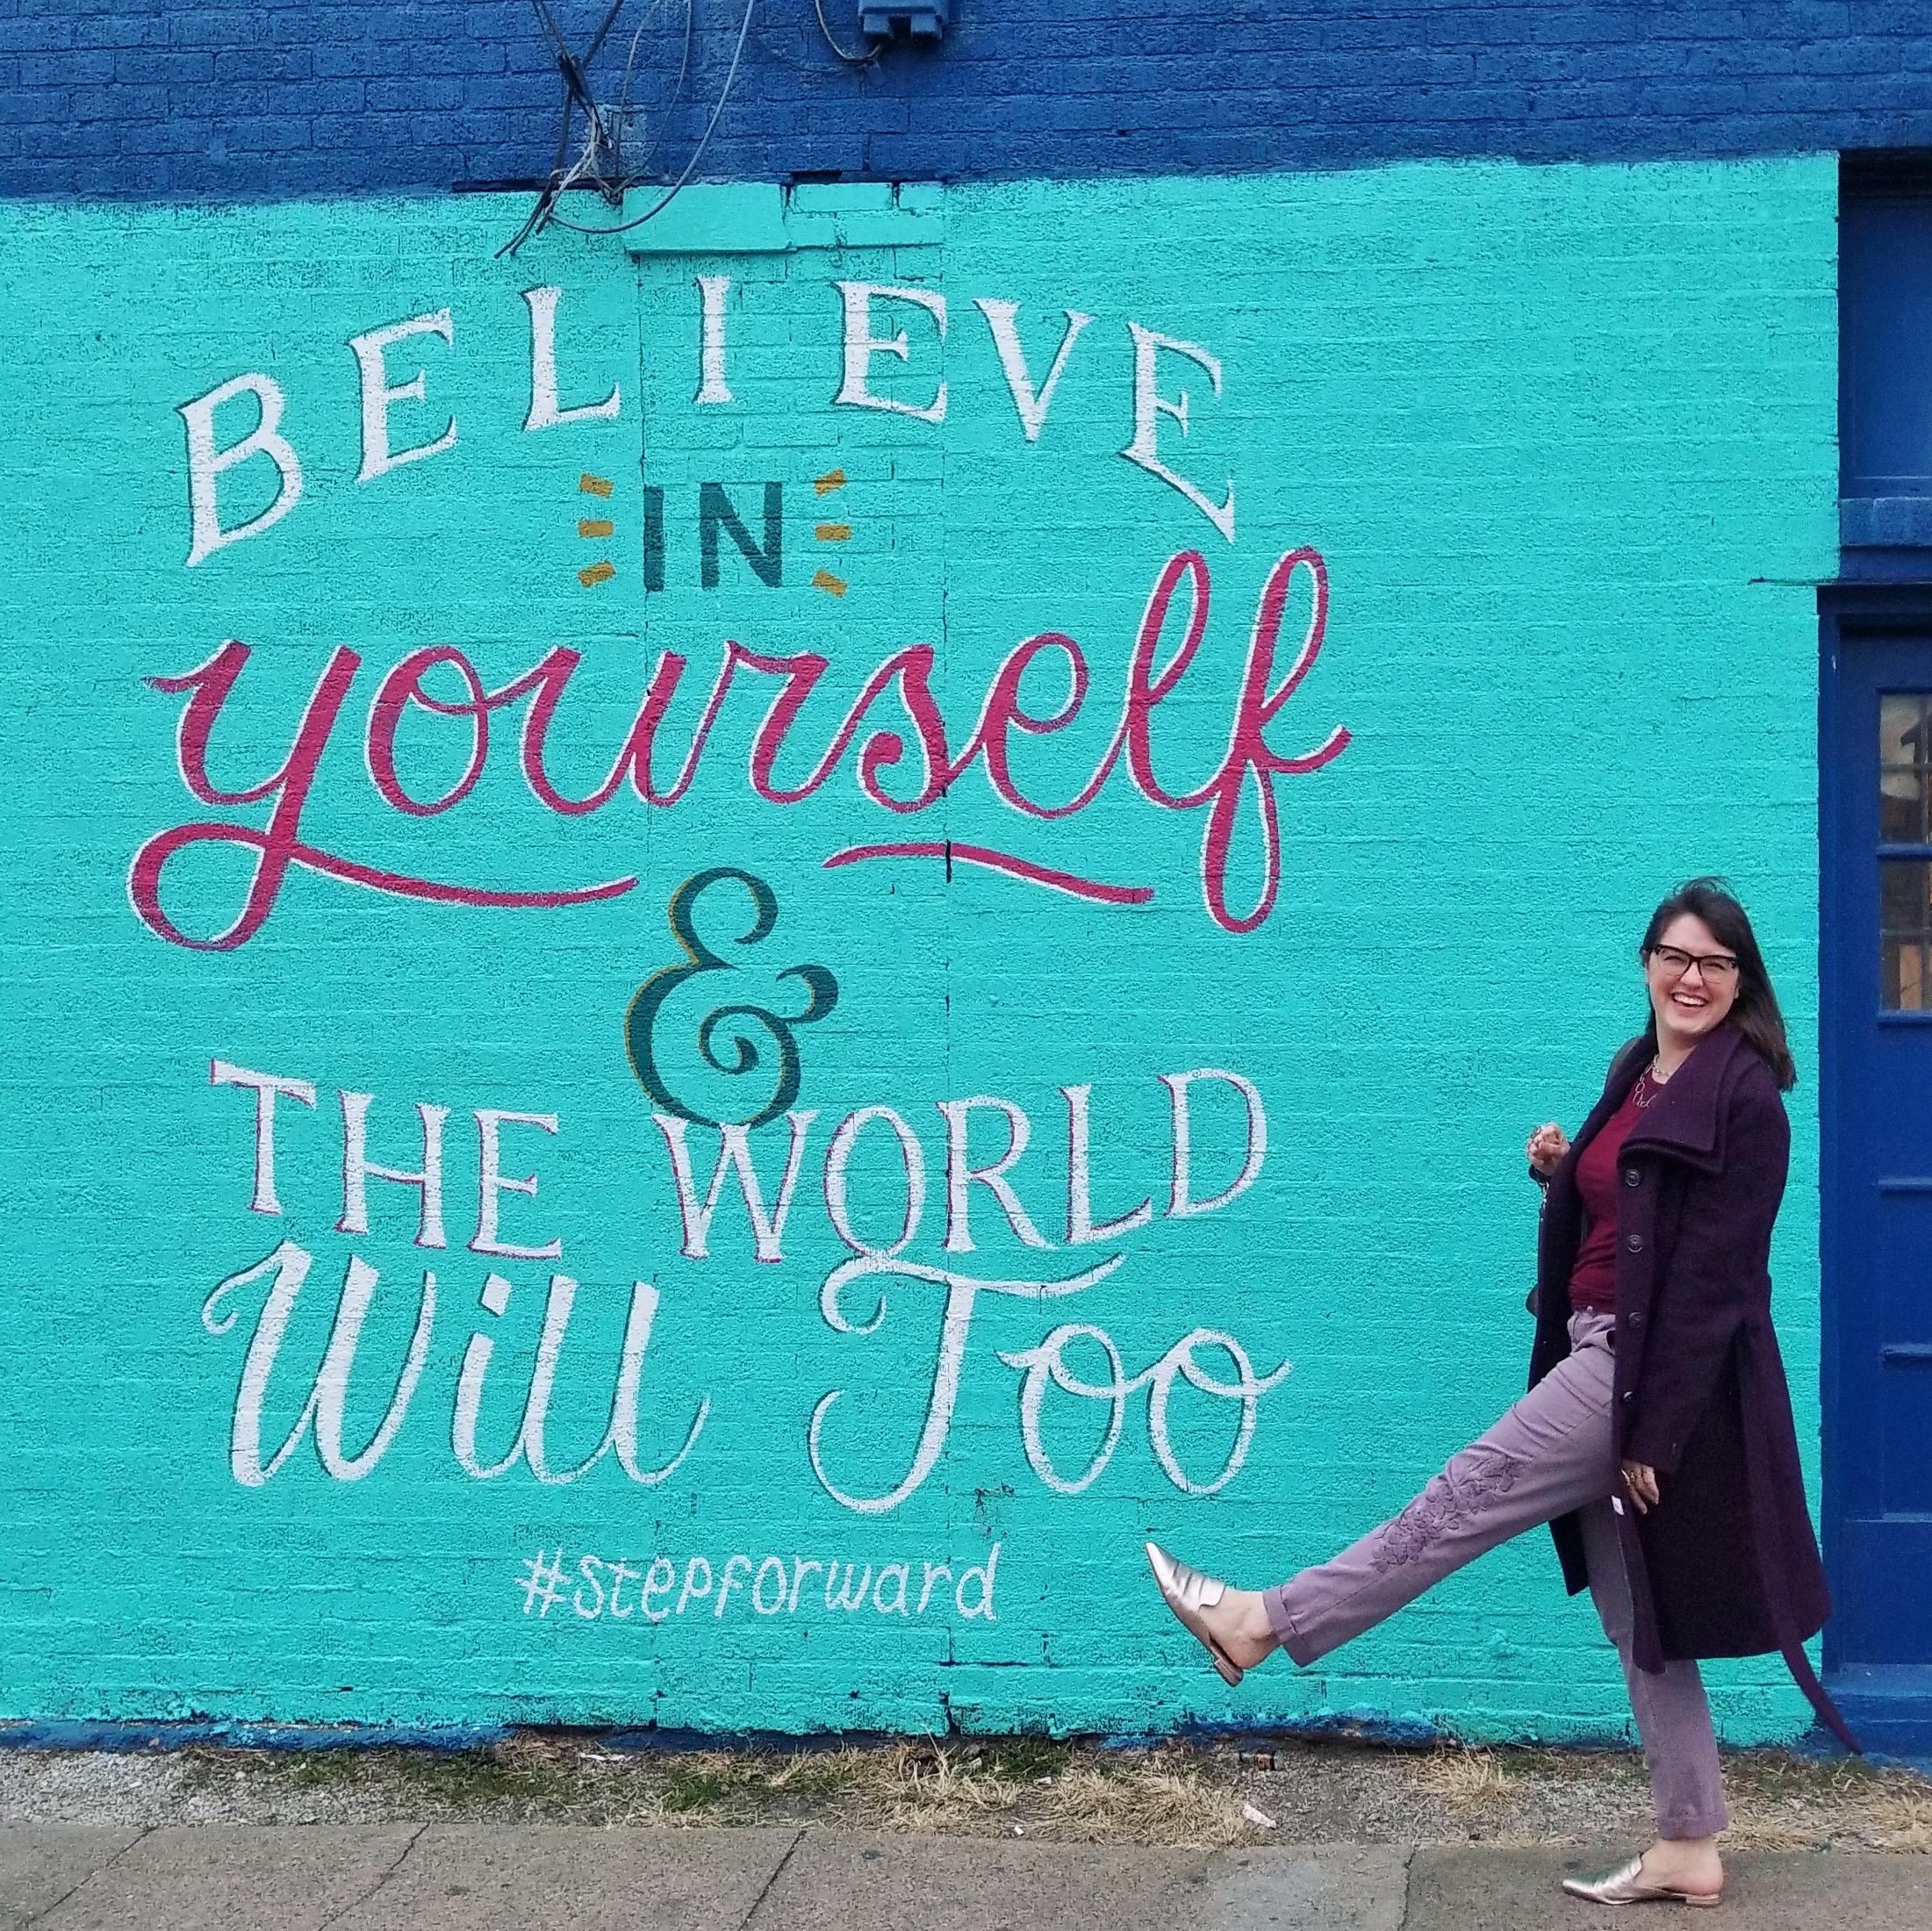 Megan at Street Art in Dallas Texas